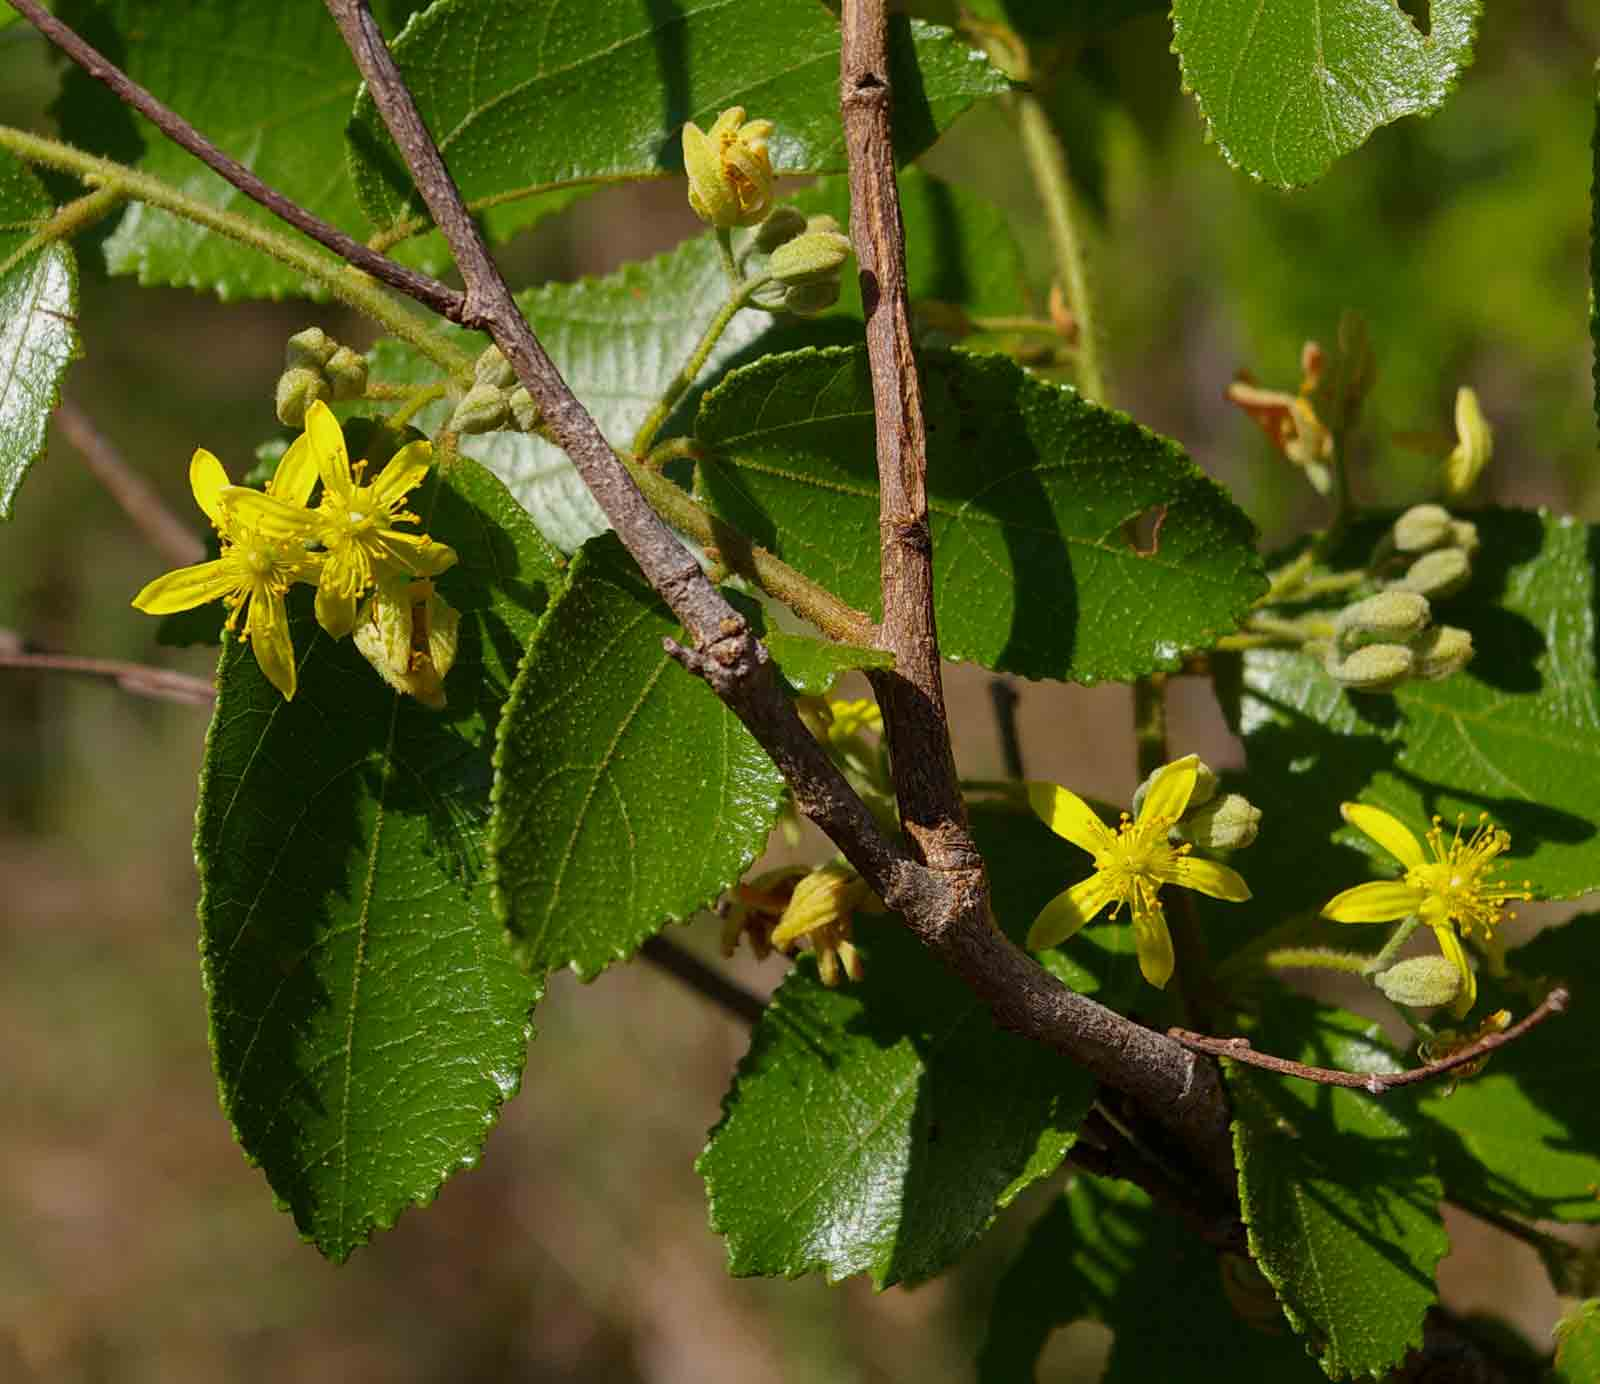 Grewia micrantha